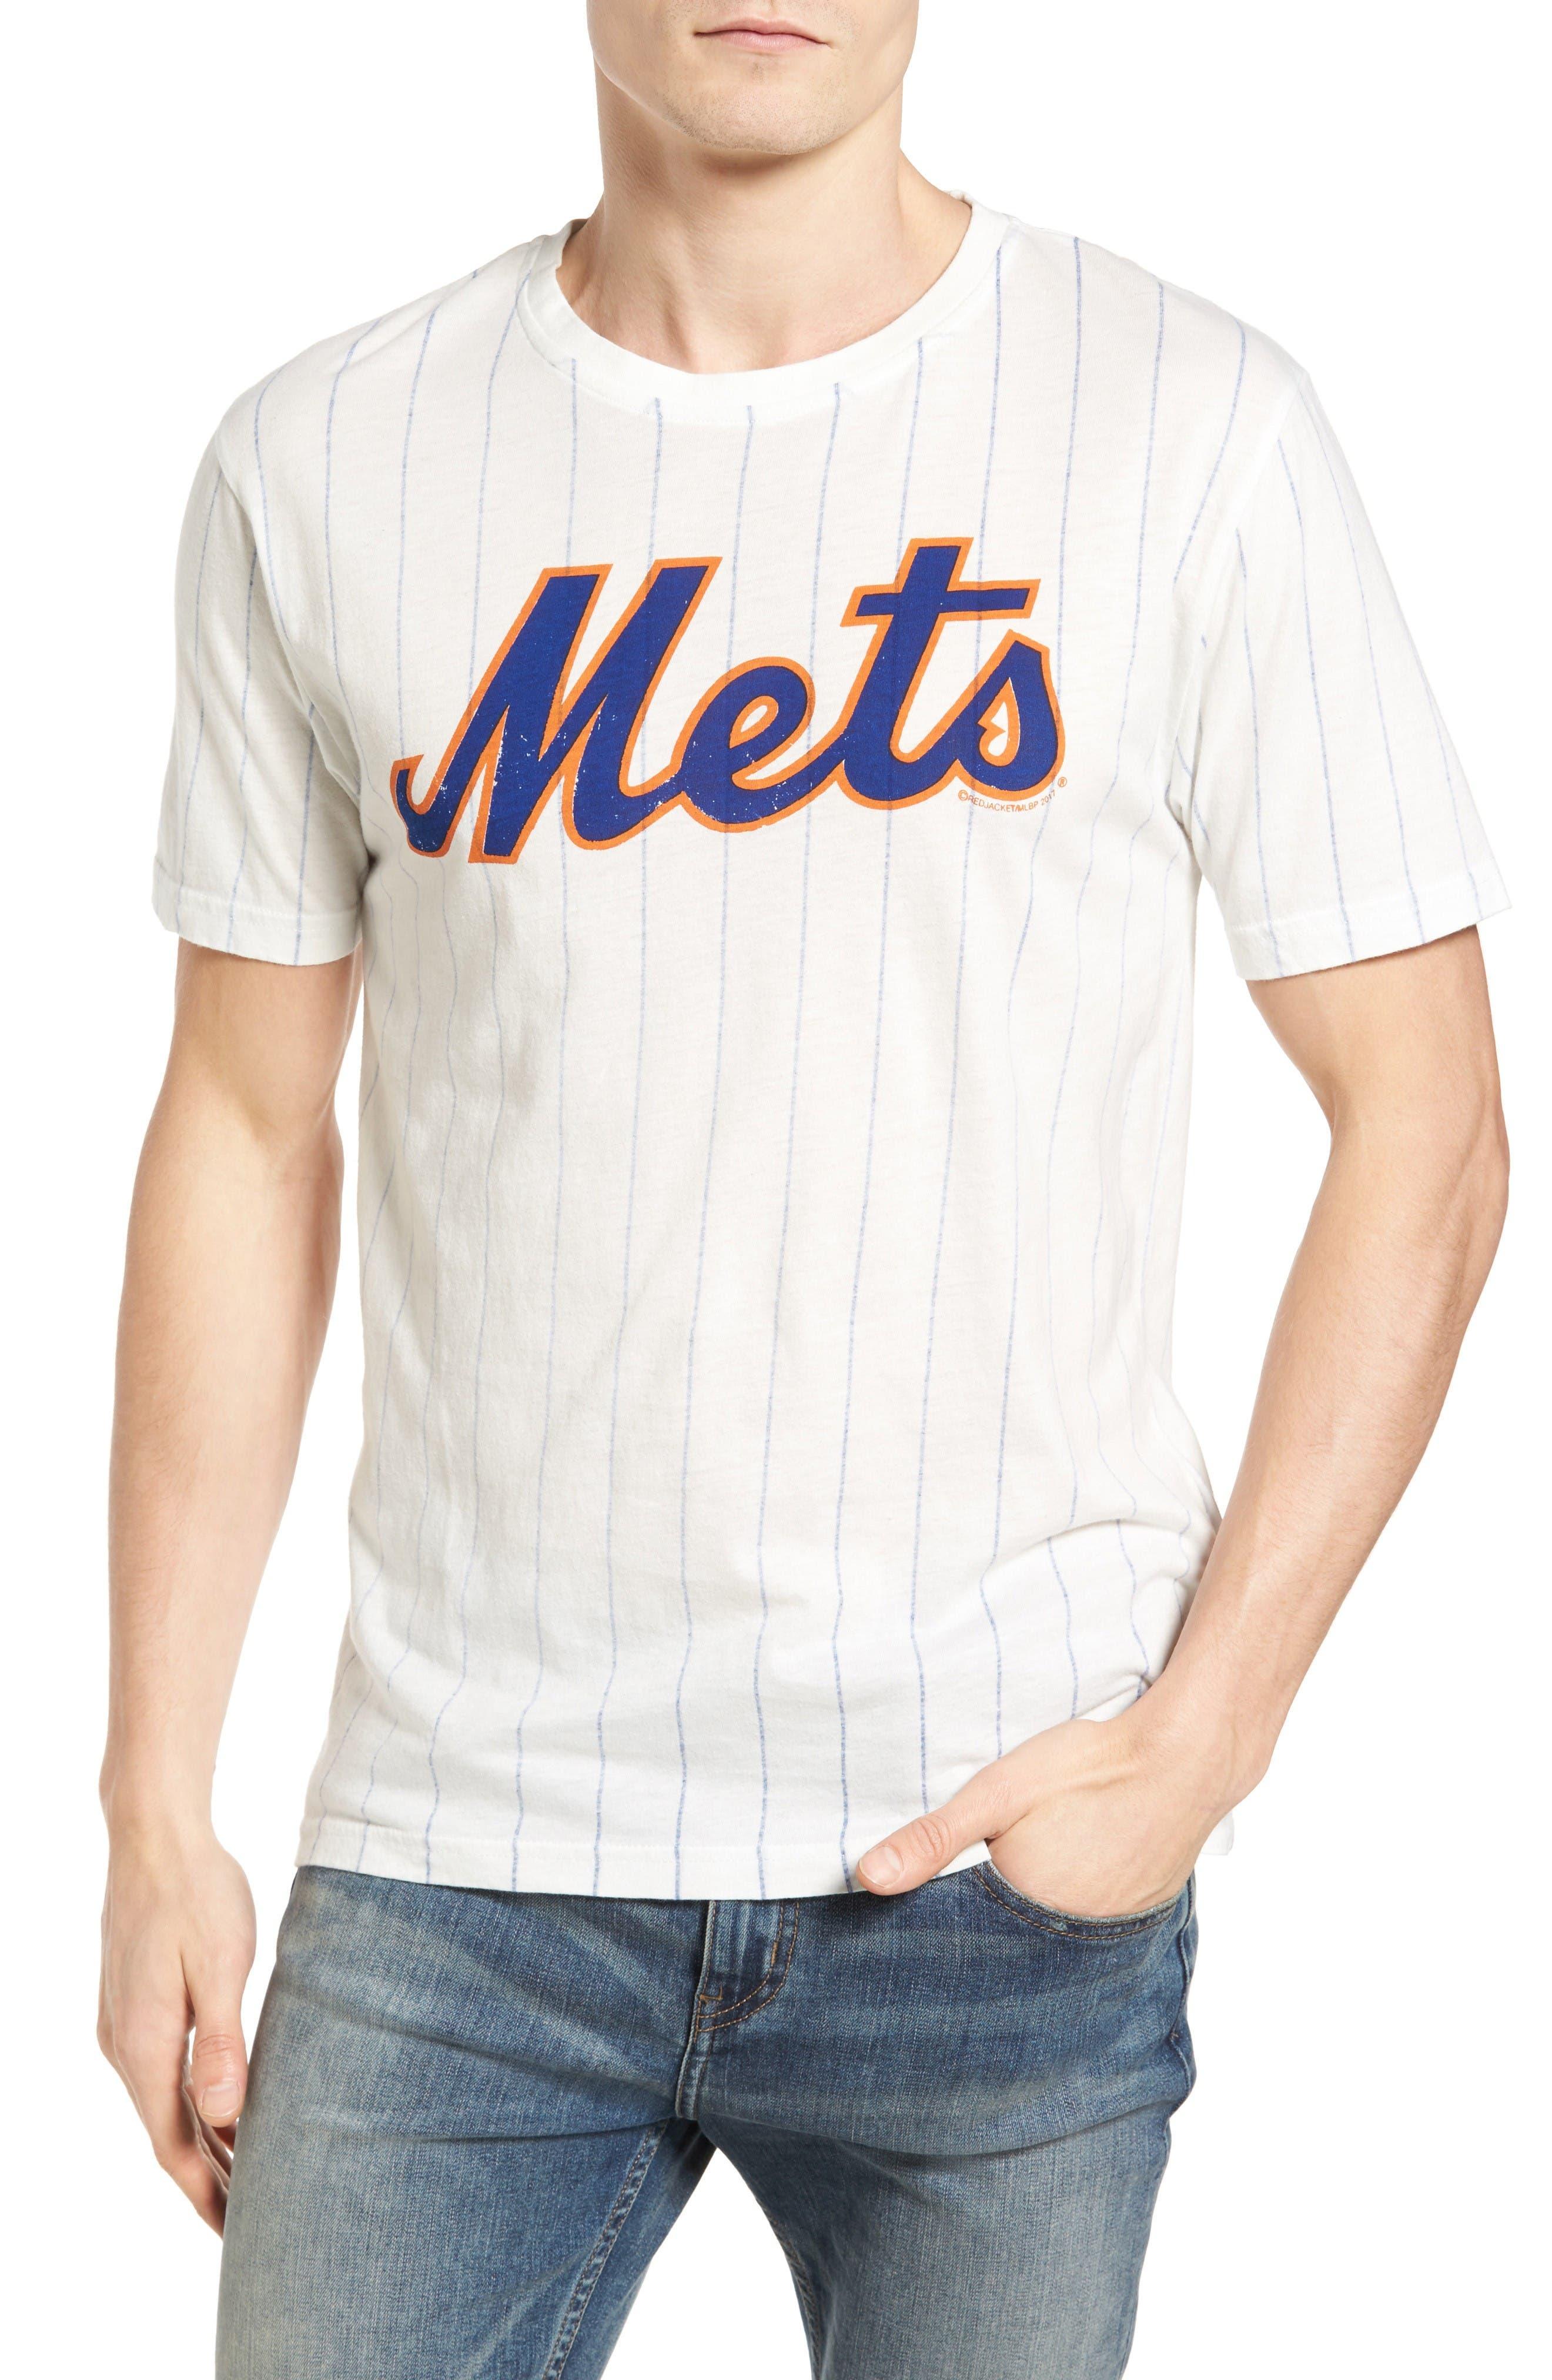 American Needle Brass Tack New York Mets T-Shirt